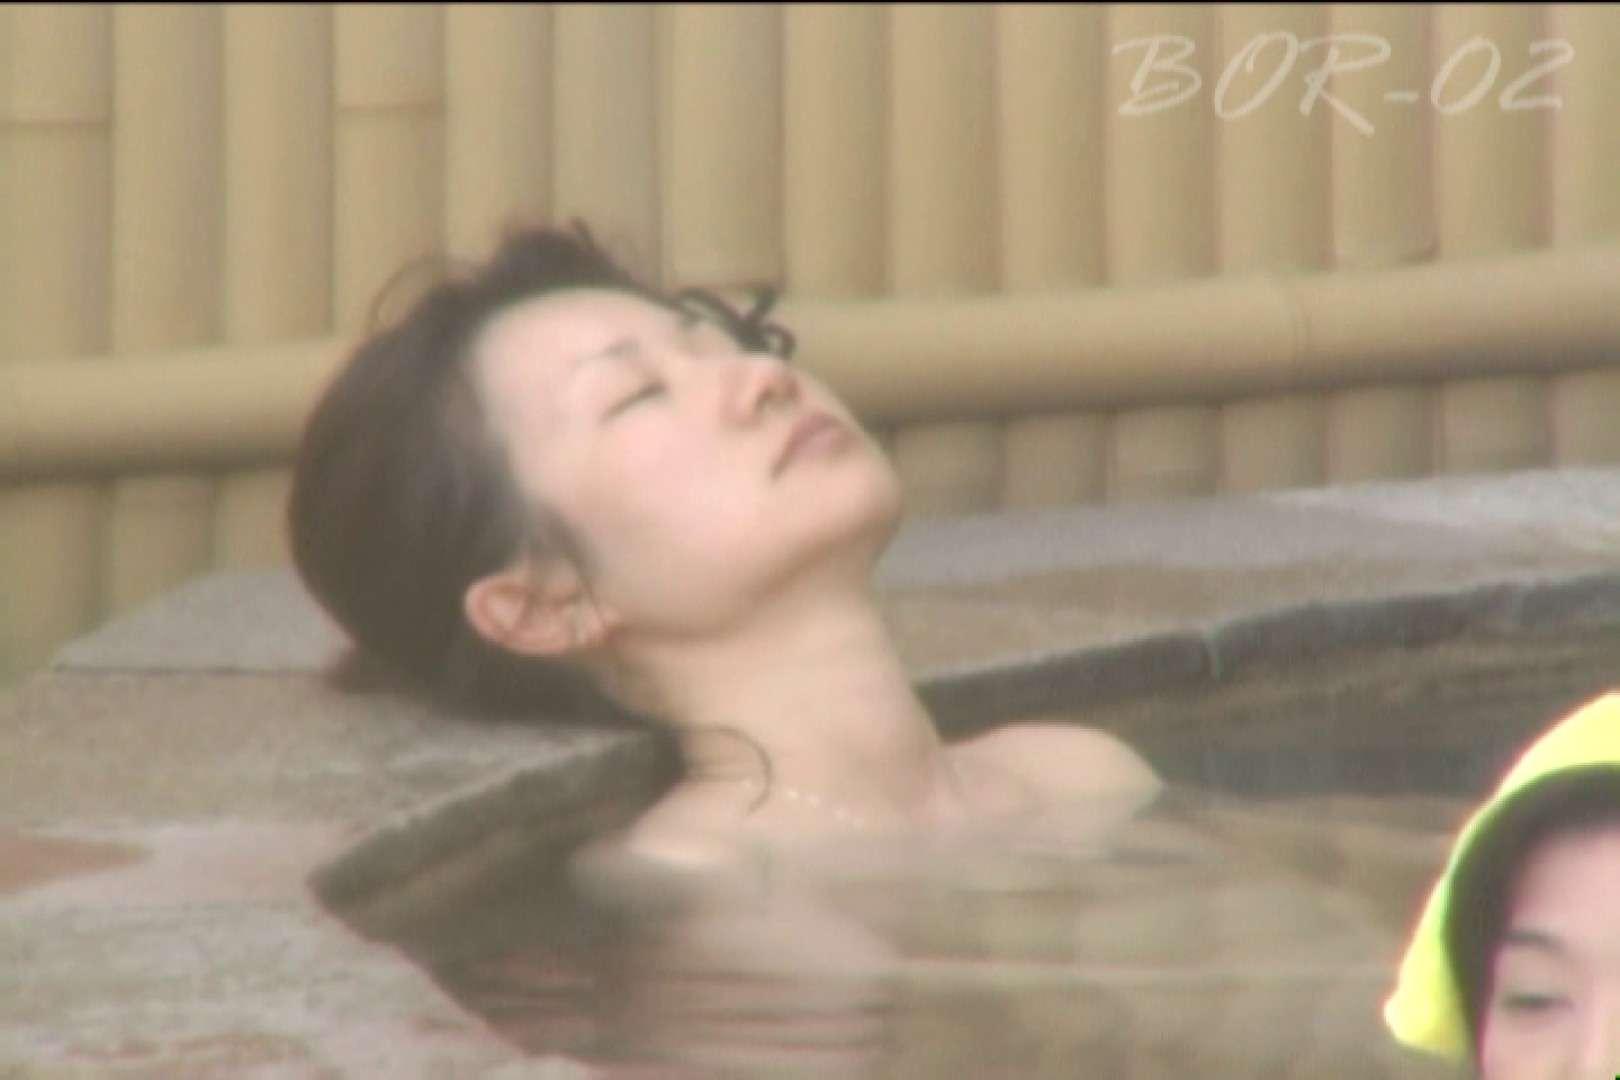 Aquaな露天風呂Vol.477 OLのプライベート  13pic 6